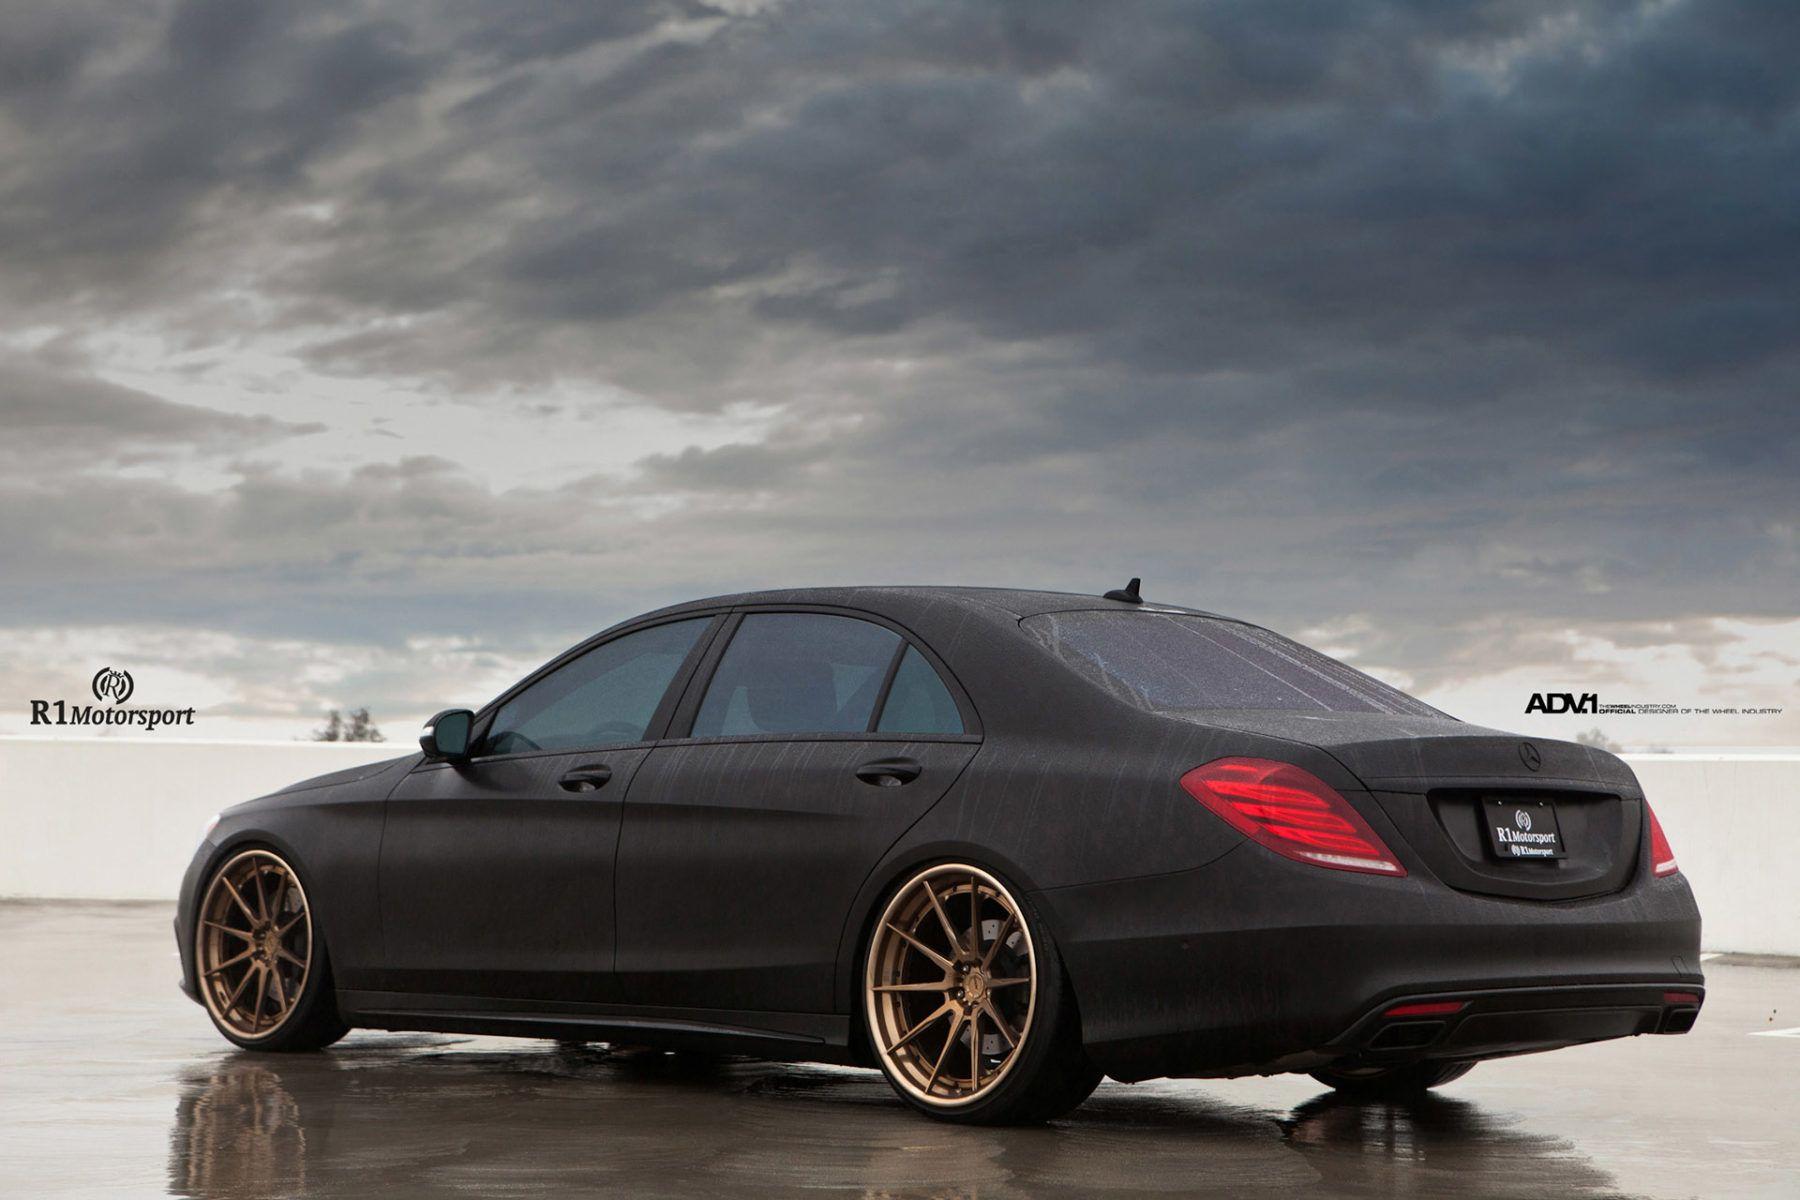 Matte Black Mercedes Benz S550 Adv10 Track Spec Cs Wheels Adv 1